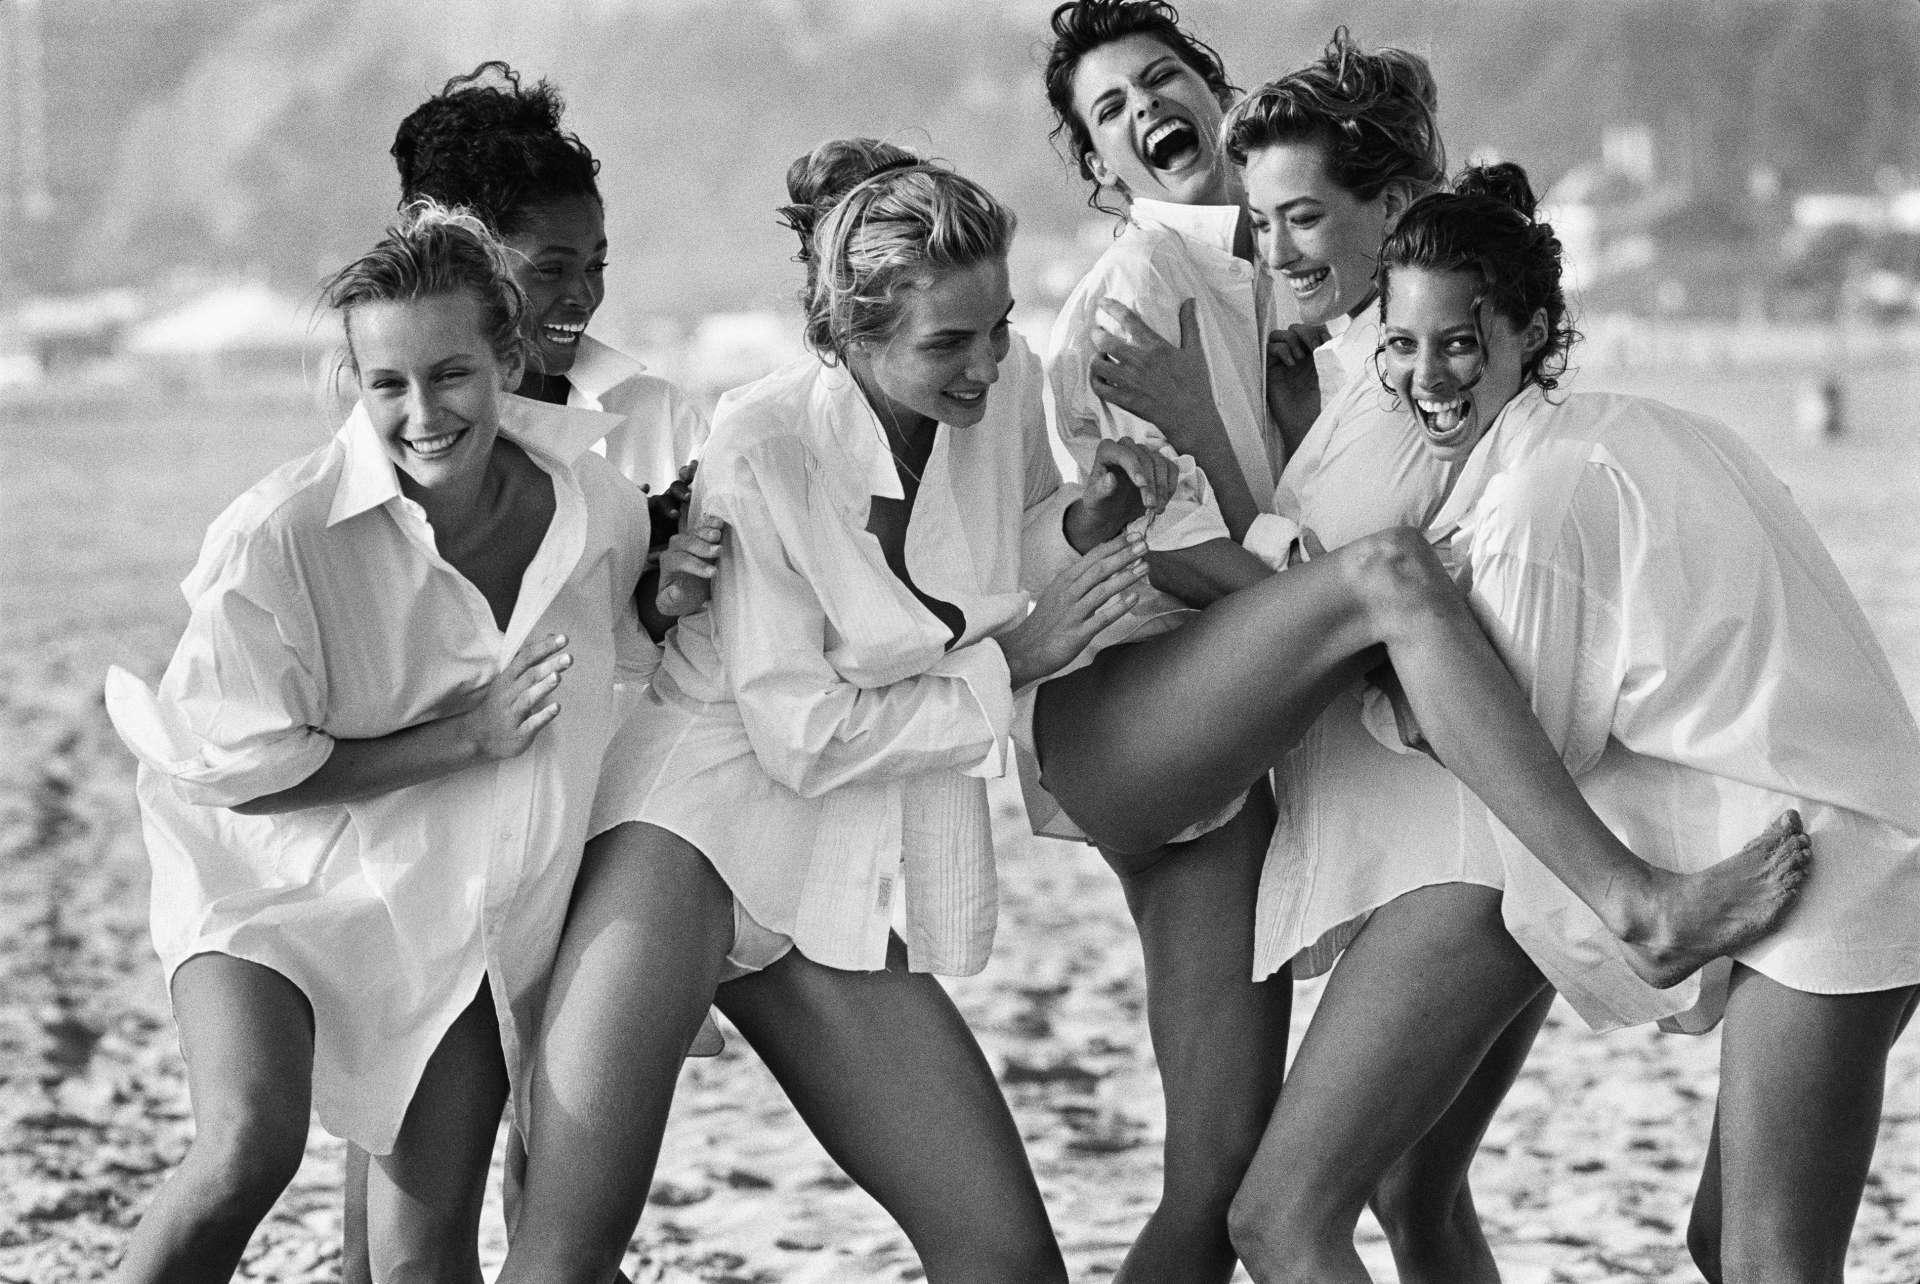 Estelle Lefébure, Karen Alexander, Rachel Williams, Linda Evangelista, Tatjana Patitz & Christy Turlington, Santa Monica, 1988